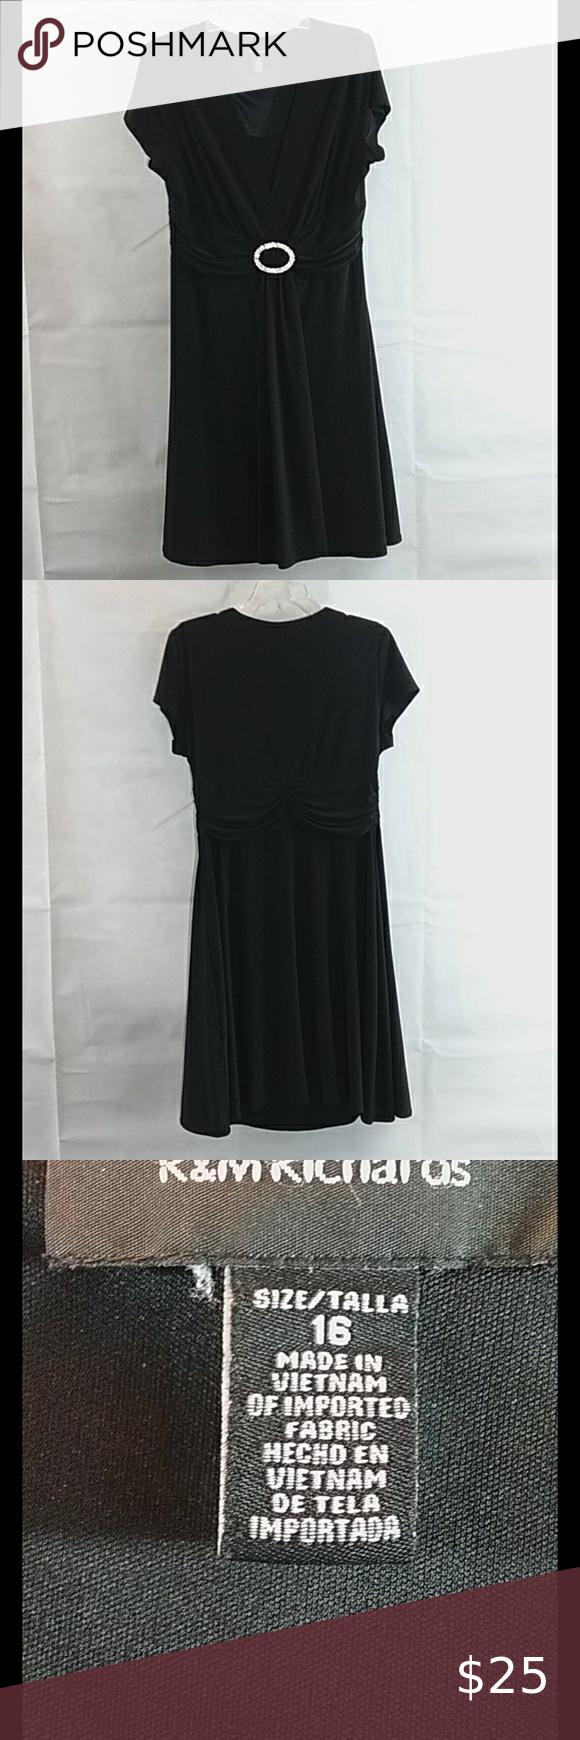 R M Richards Black Dress Size 16 Petite Cocktail Dresses Cocktail Dress Lace V Neck Cocktail Dress [ 1740 x 580 Pixel ]